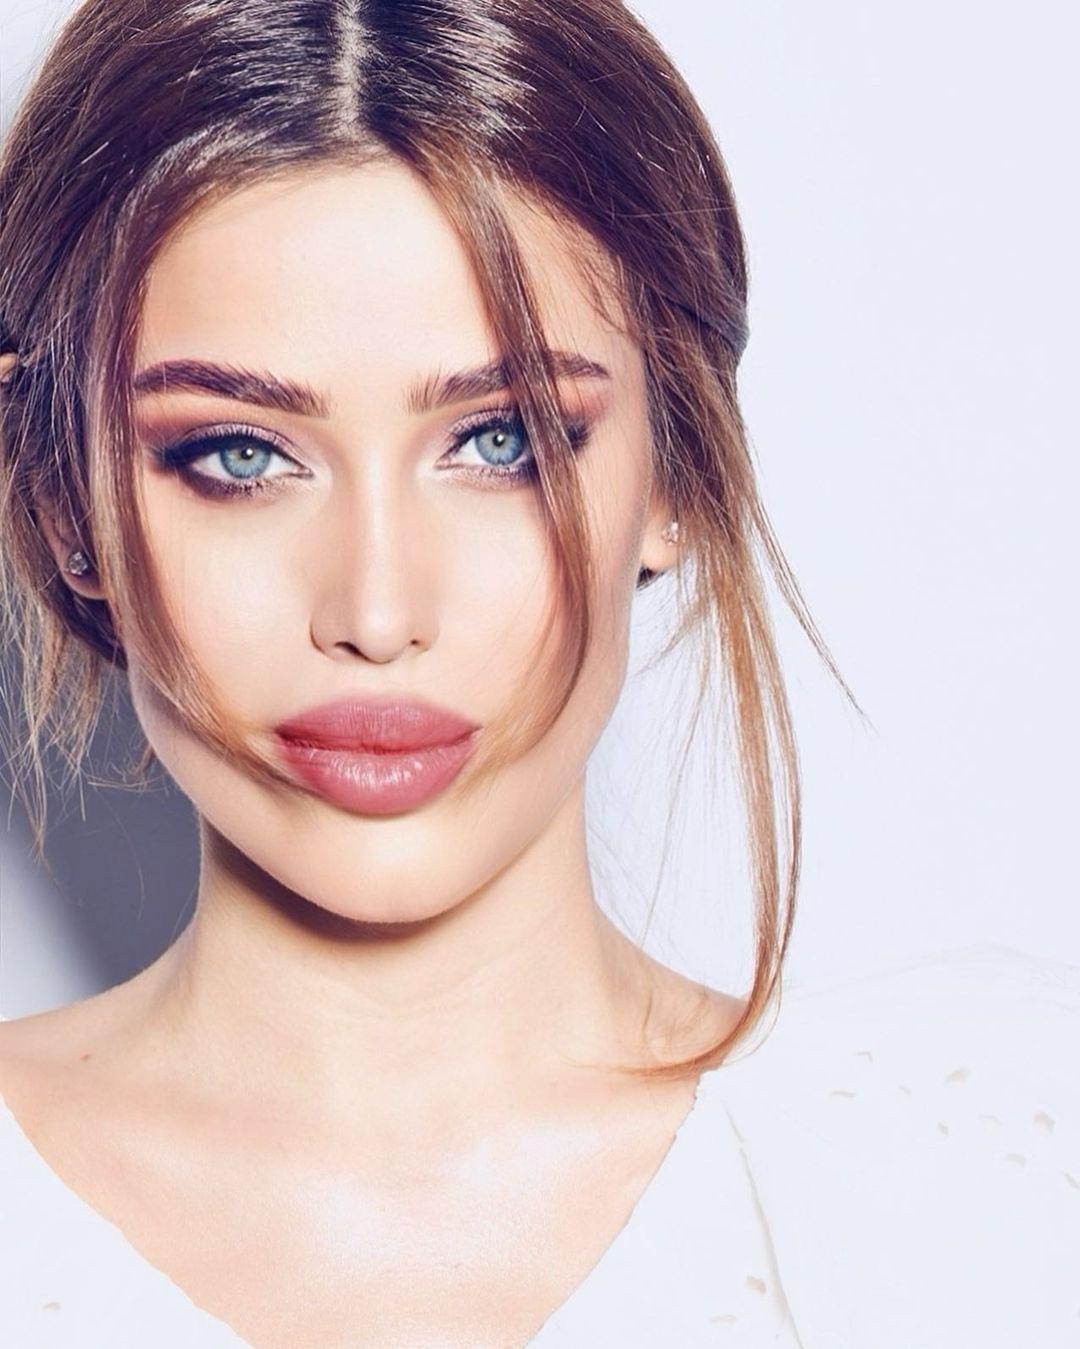 Miranda-Sheliya-Wallpapers-Insta-Fit-Bio-14